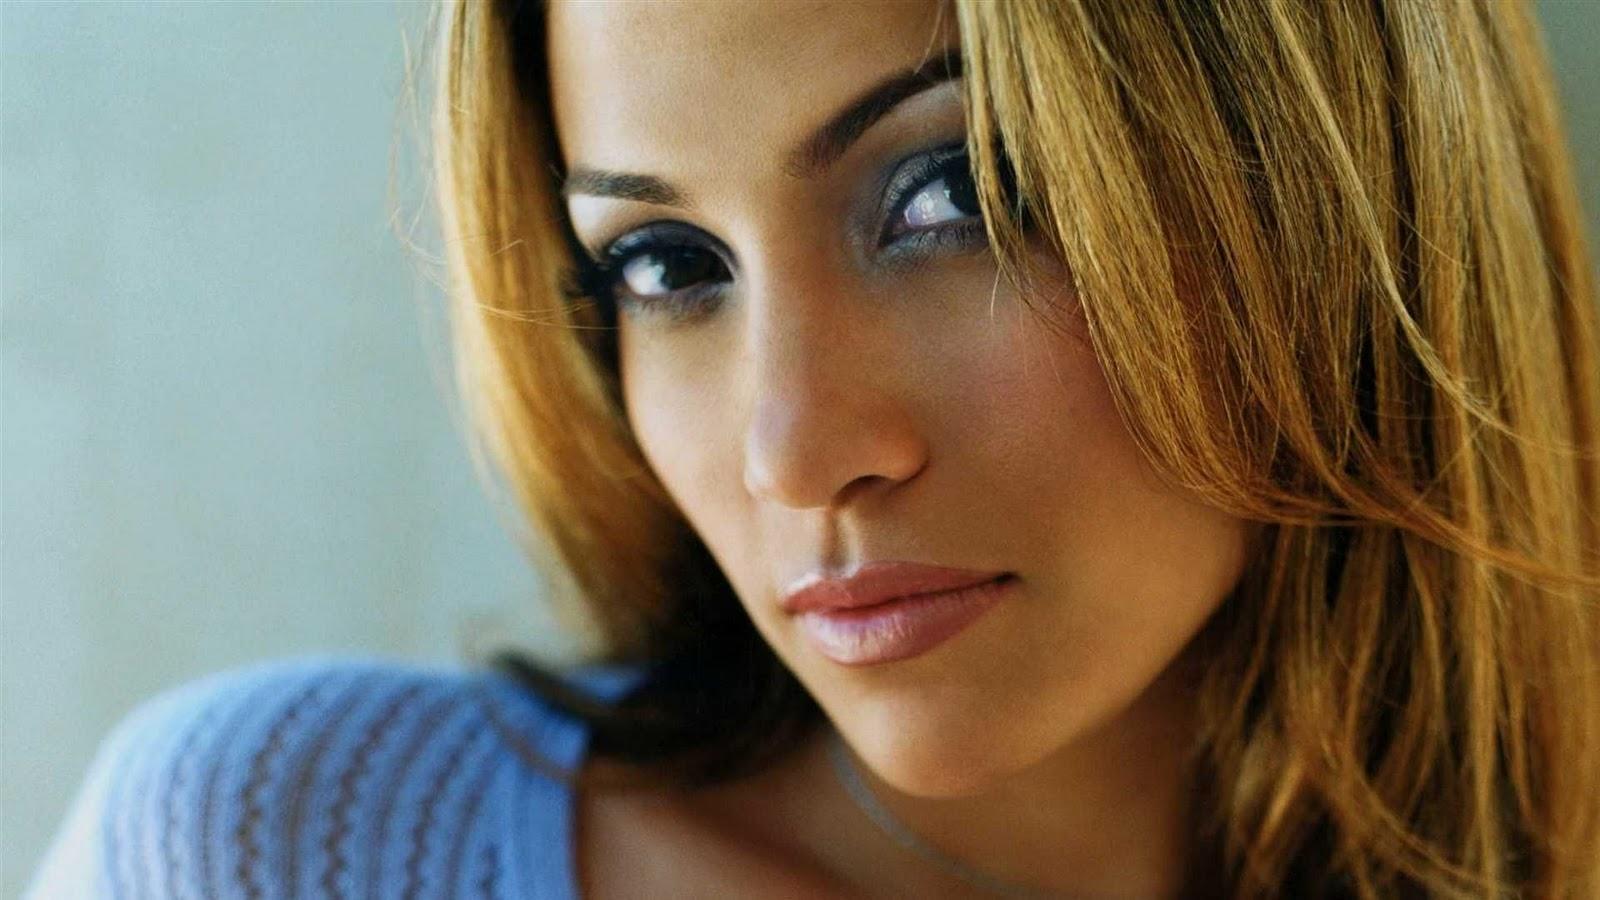 FREE HD WALLPAPER: Jennifer Lopez Wallpapers